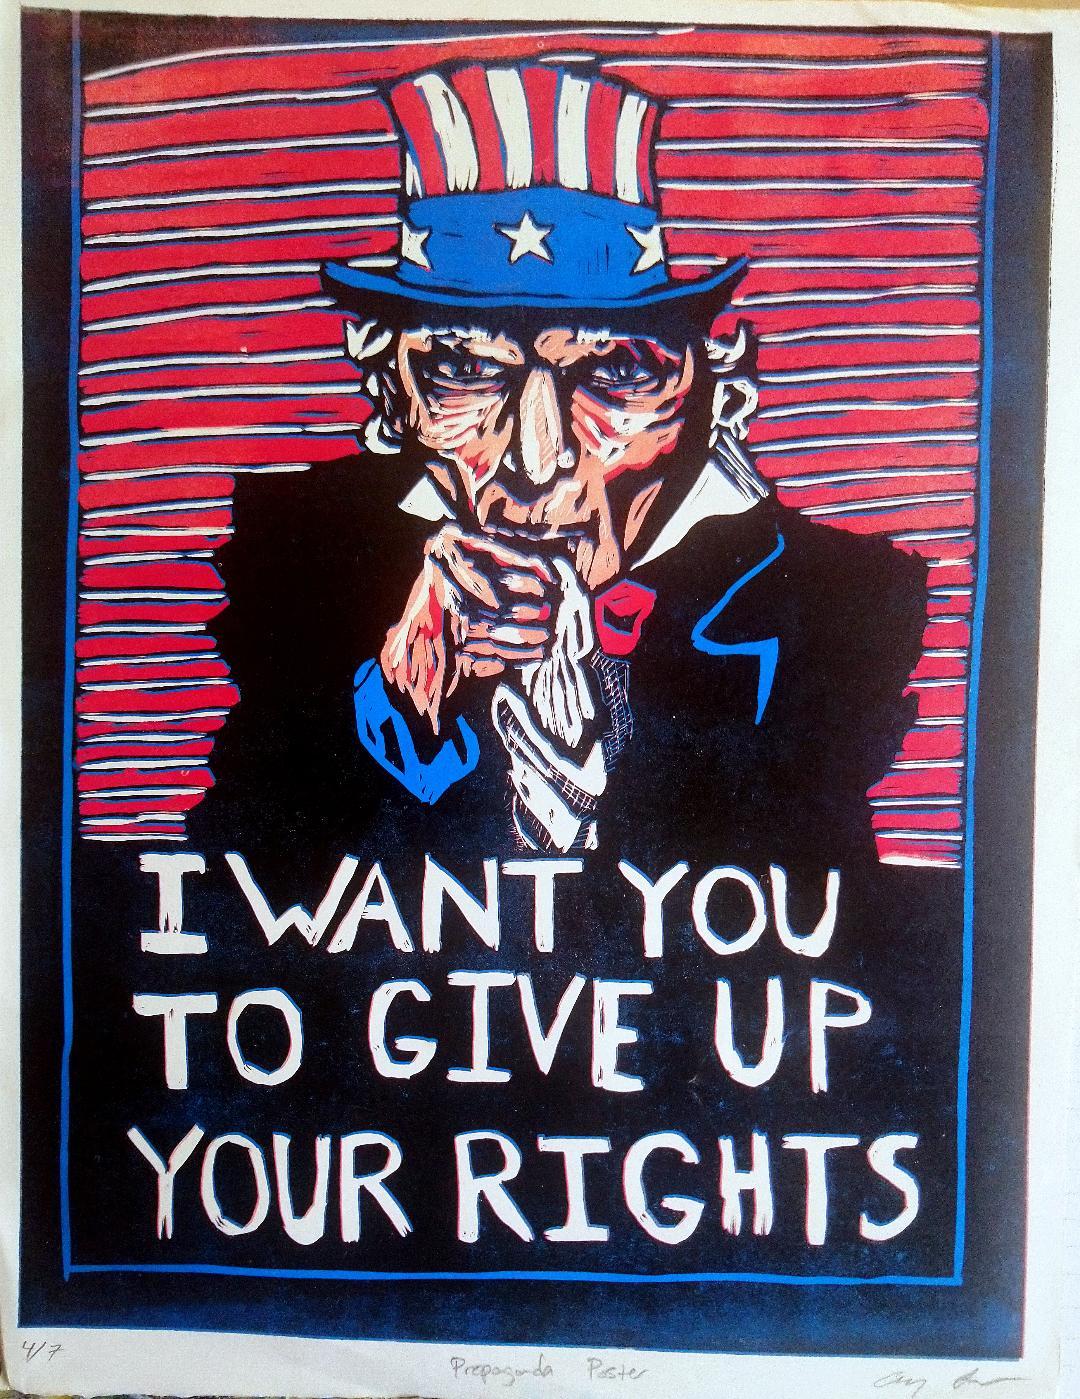 "Propaganda Poster - Andrew Layne - 18x24"" - $180"